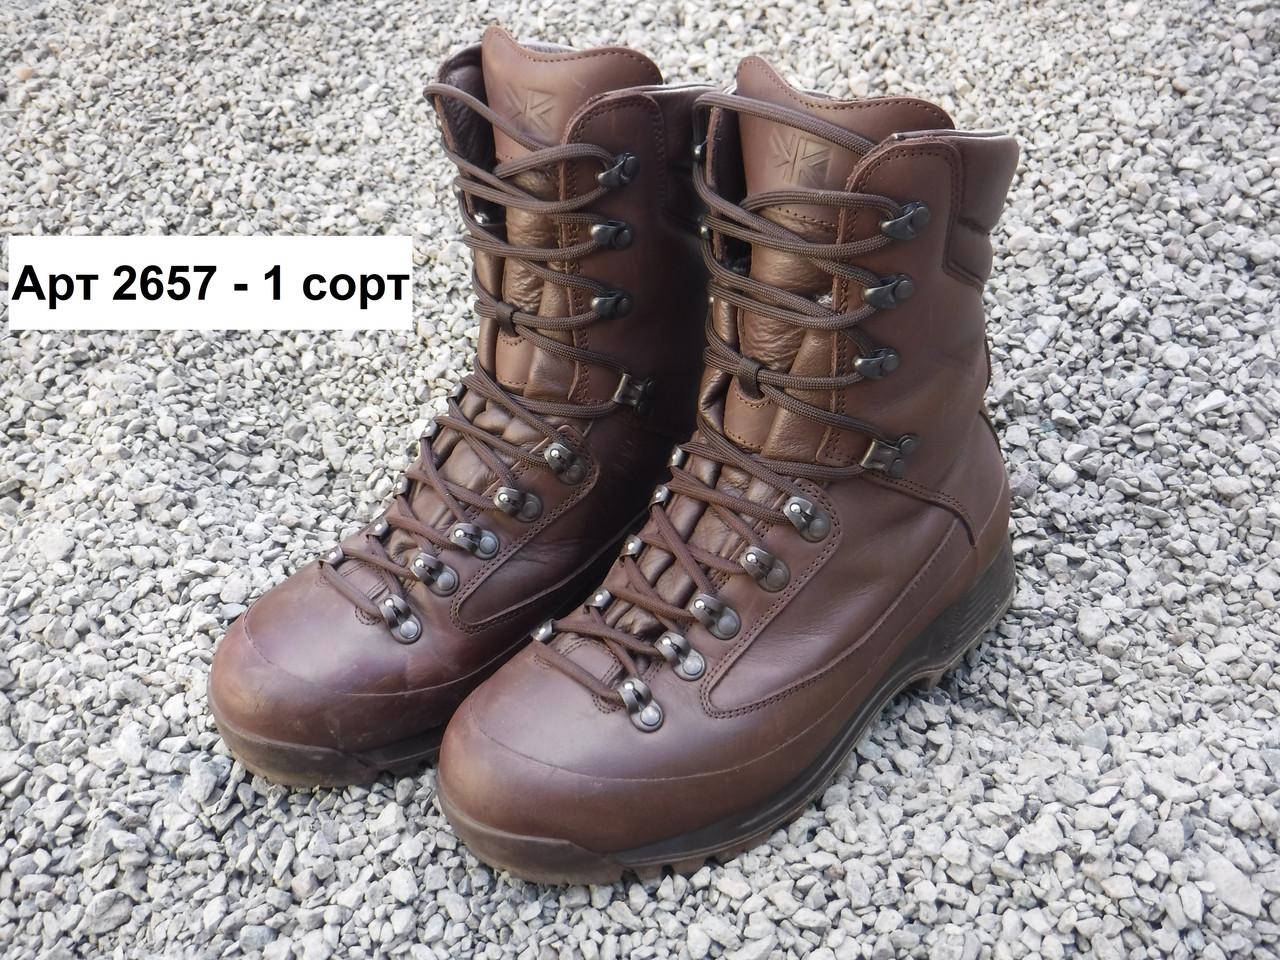 Черевики KARRIMOR Combat Cold Wet Weather Boots оригінал Б/У 1 сорт